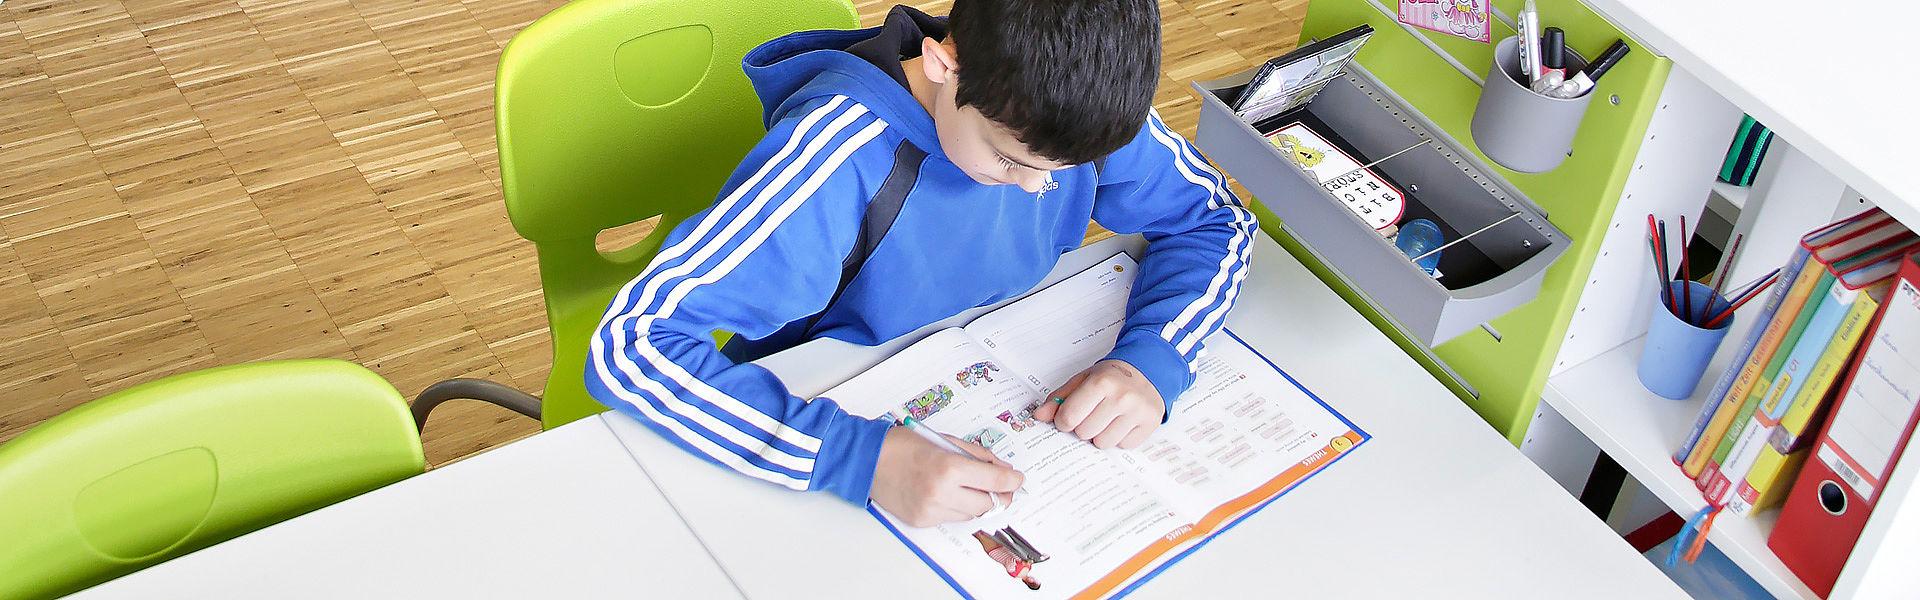 Bild: Schüler bei den Hausaufgaben